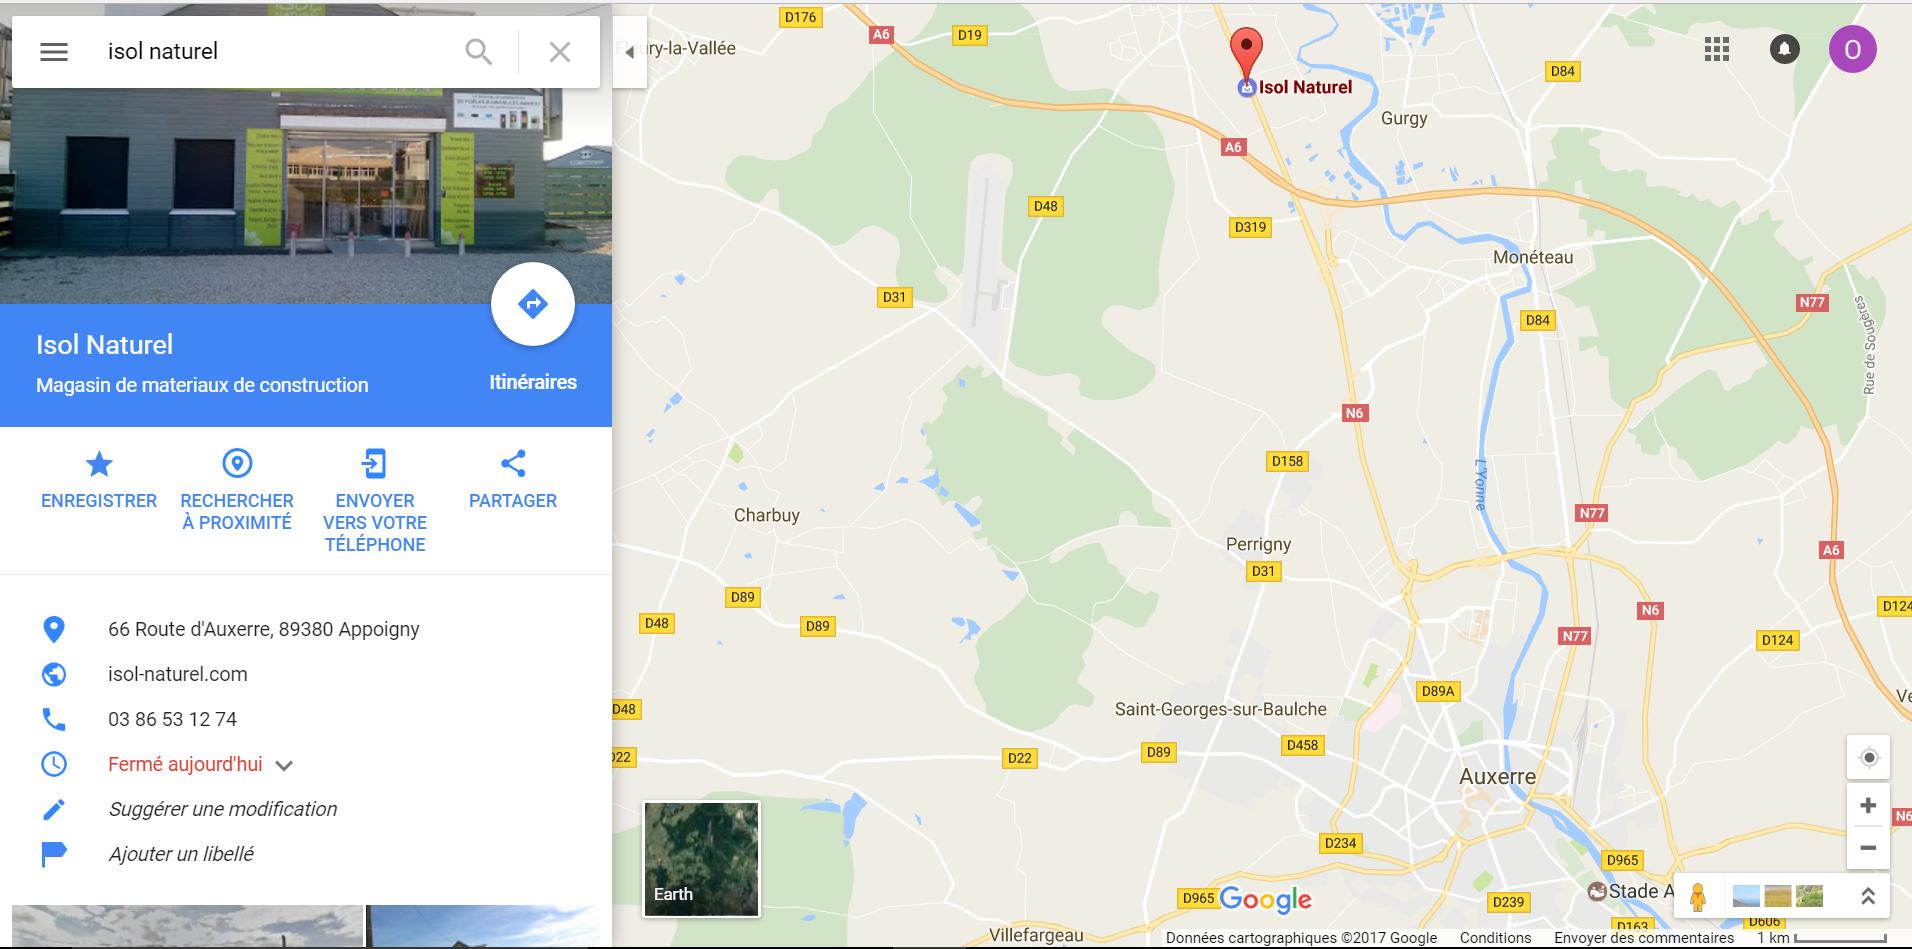 Position magasin plancher chauffant Isol Naturel Auxerre